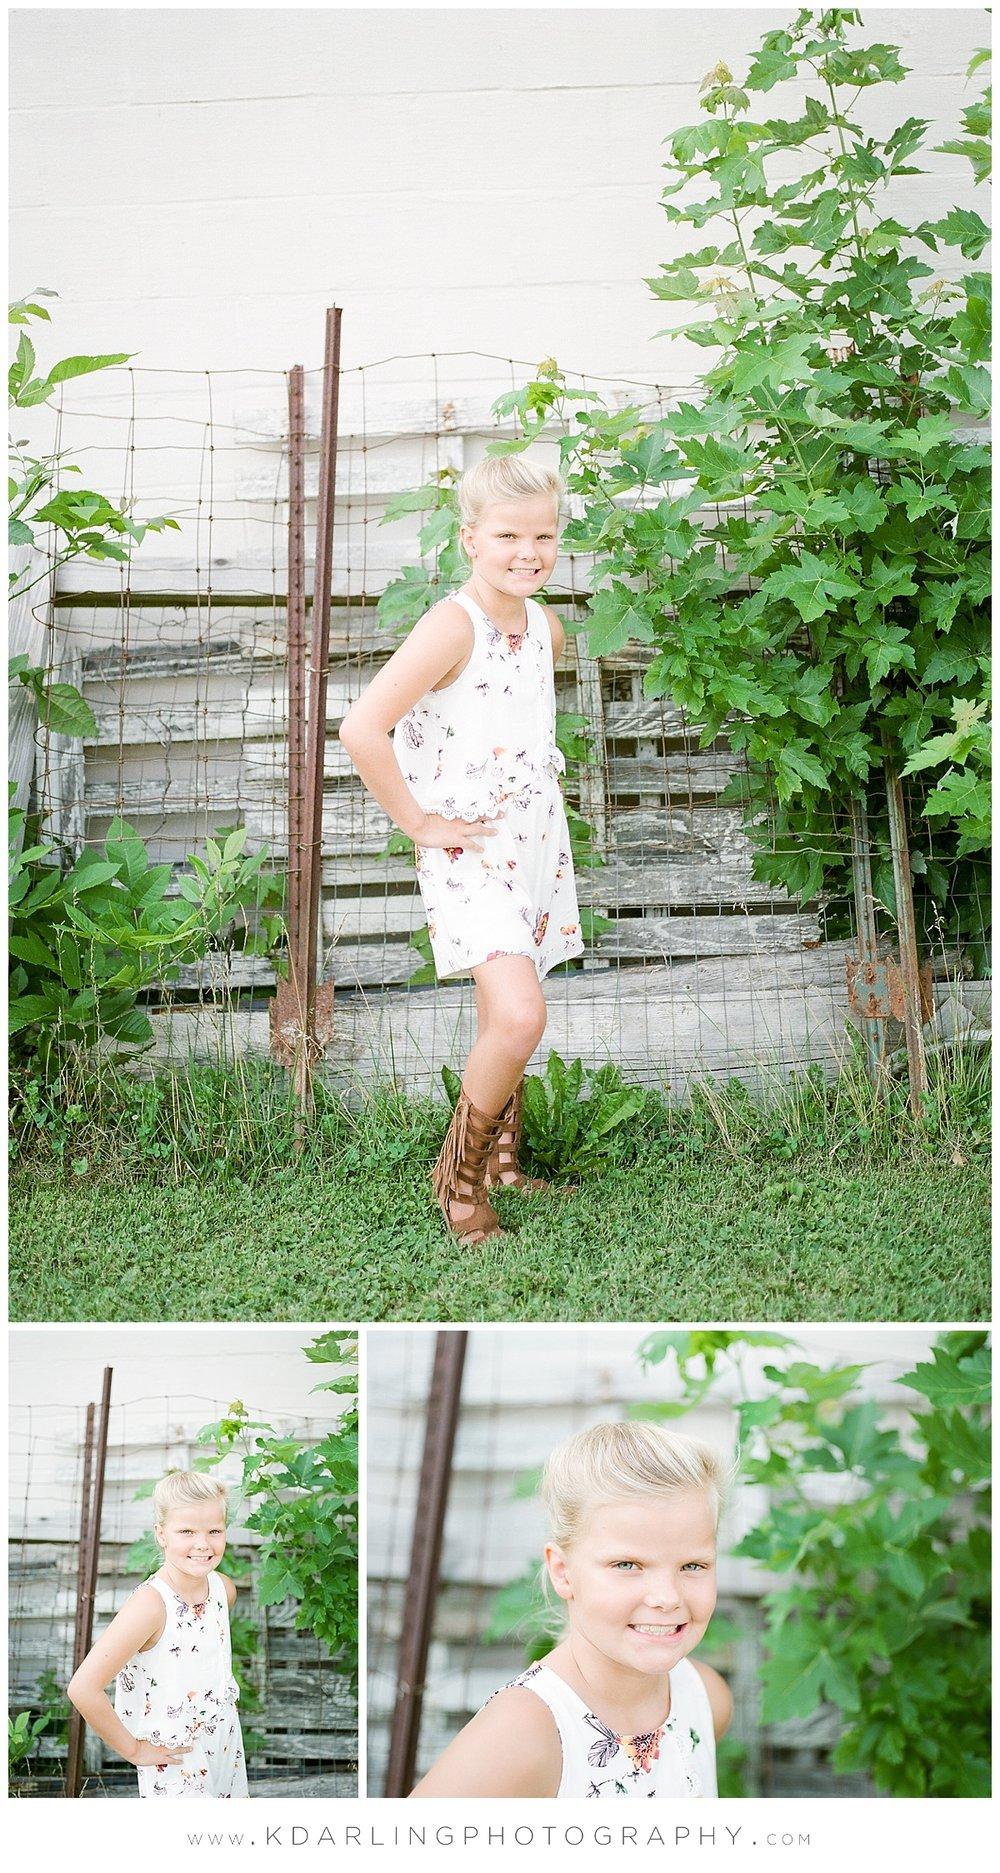 Pre-tween girl in white dress